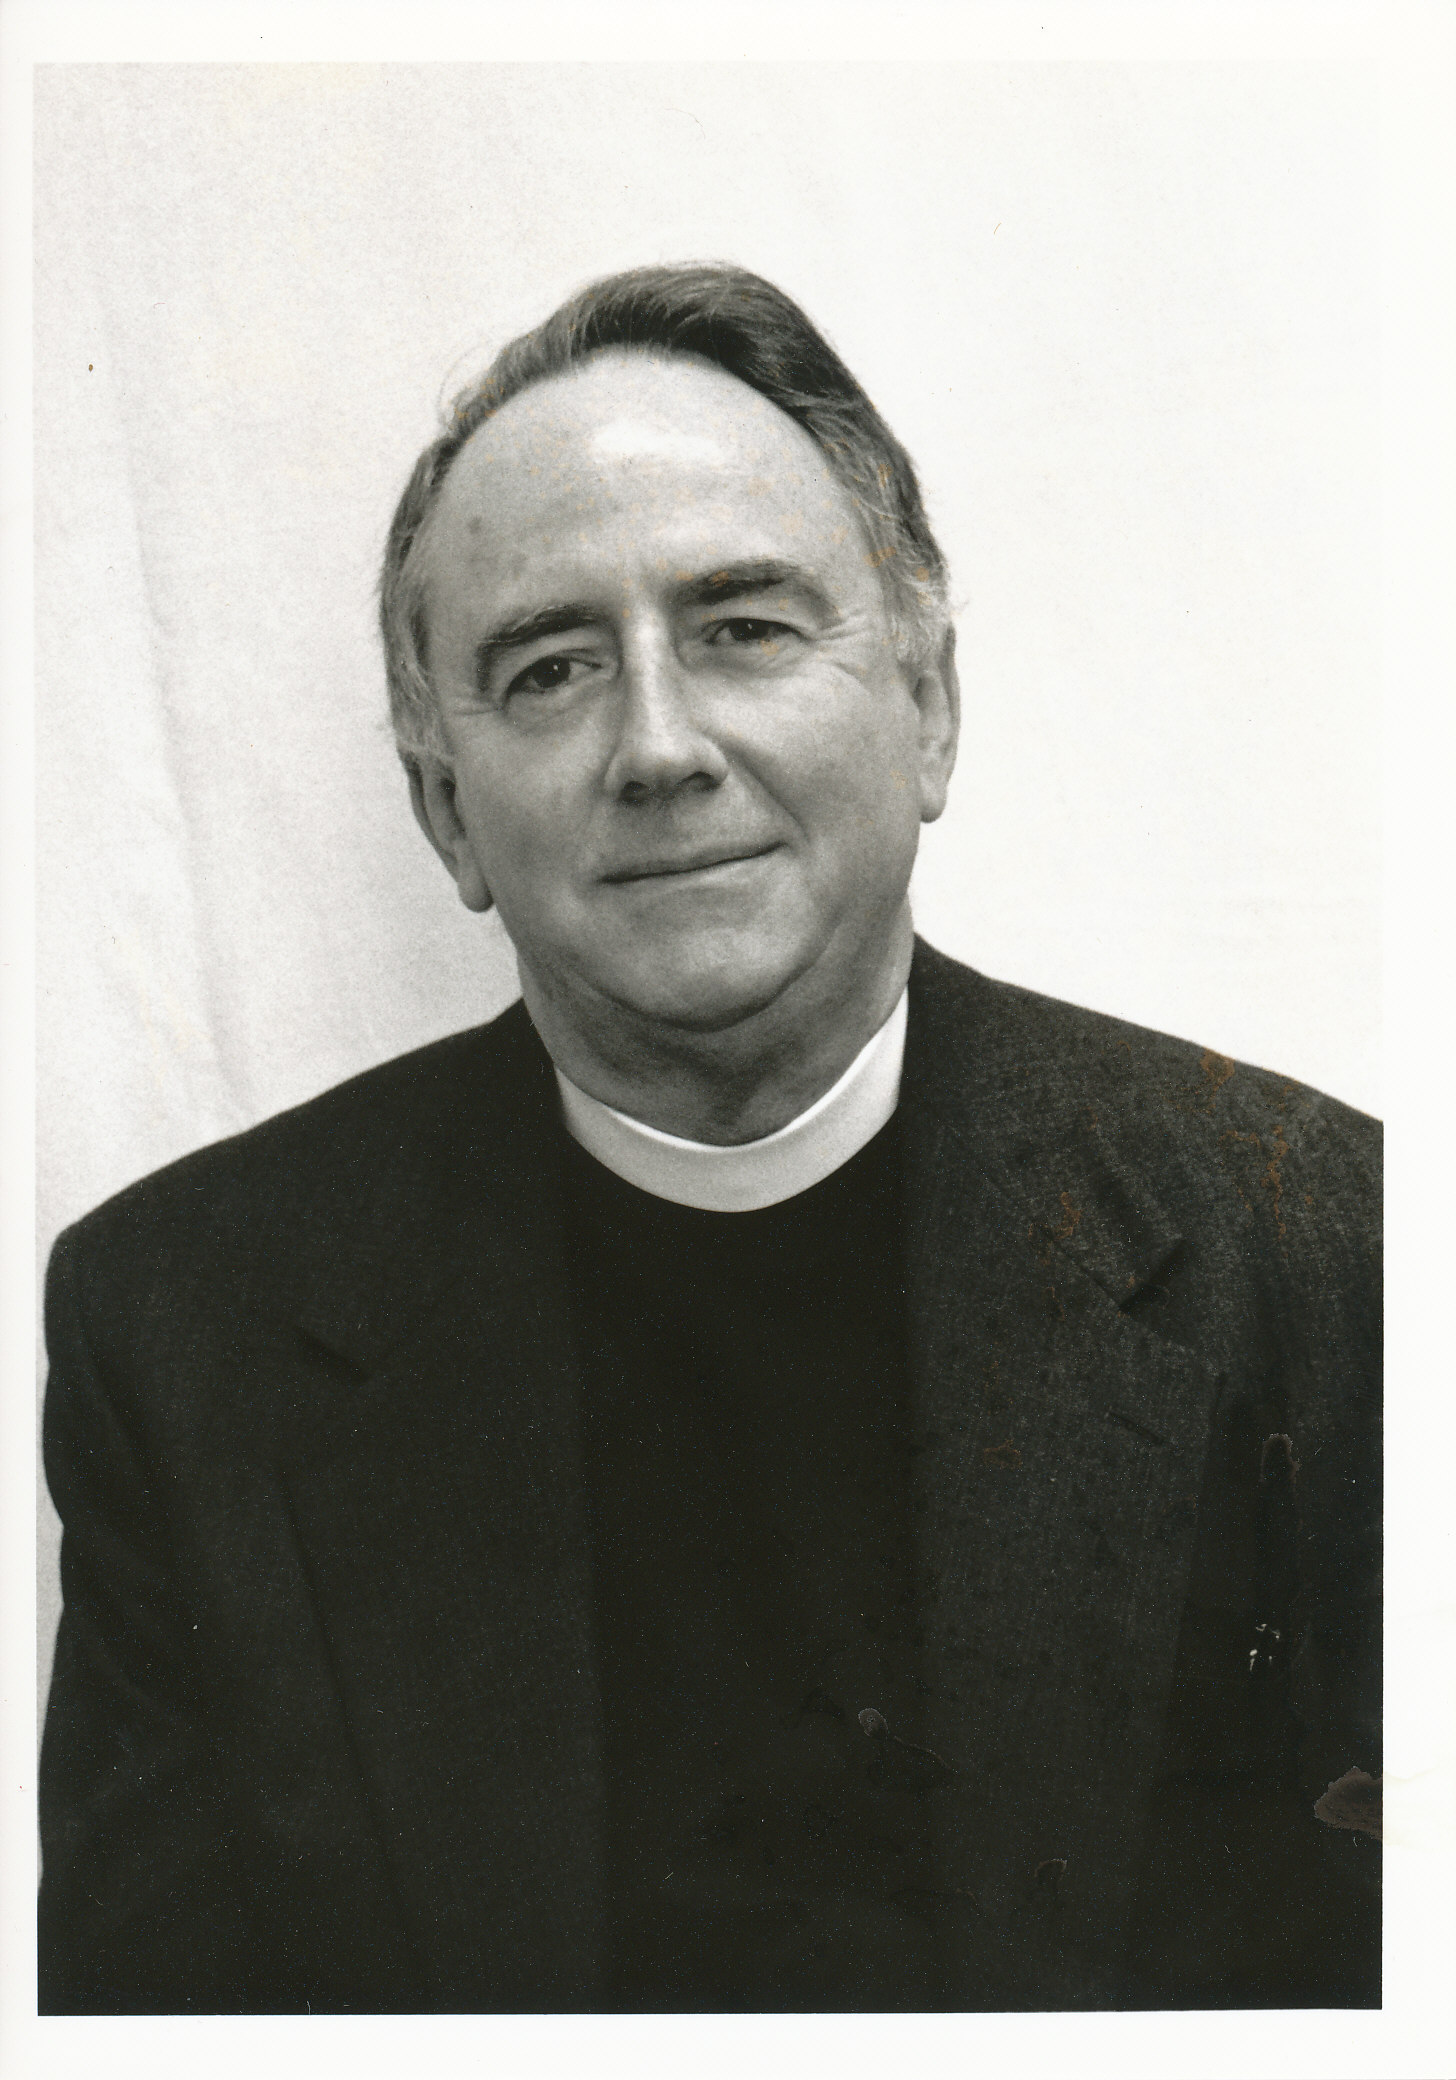 Locke Bowman